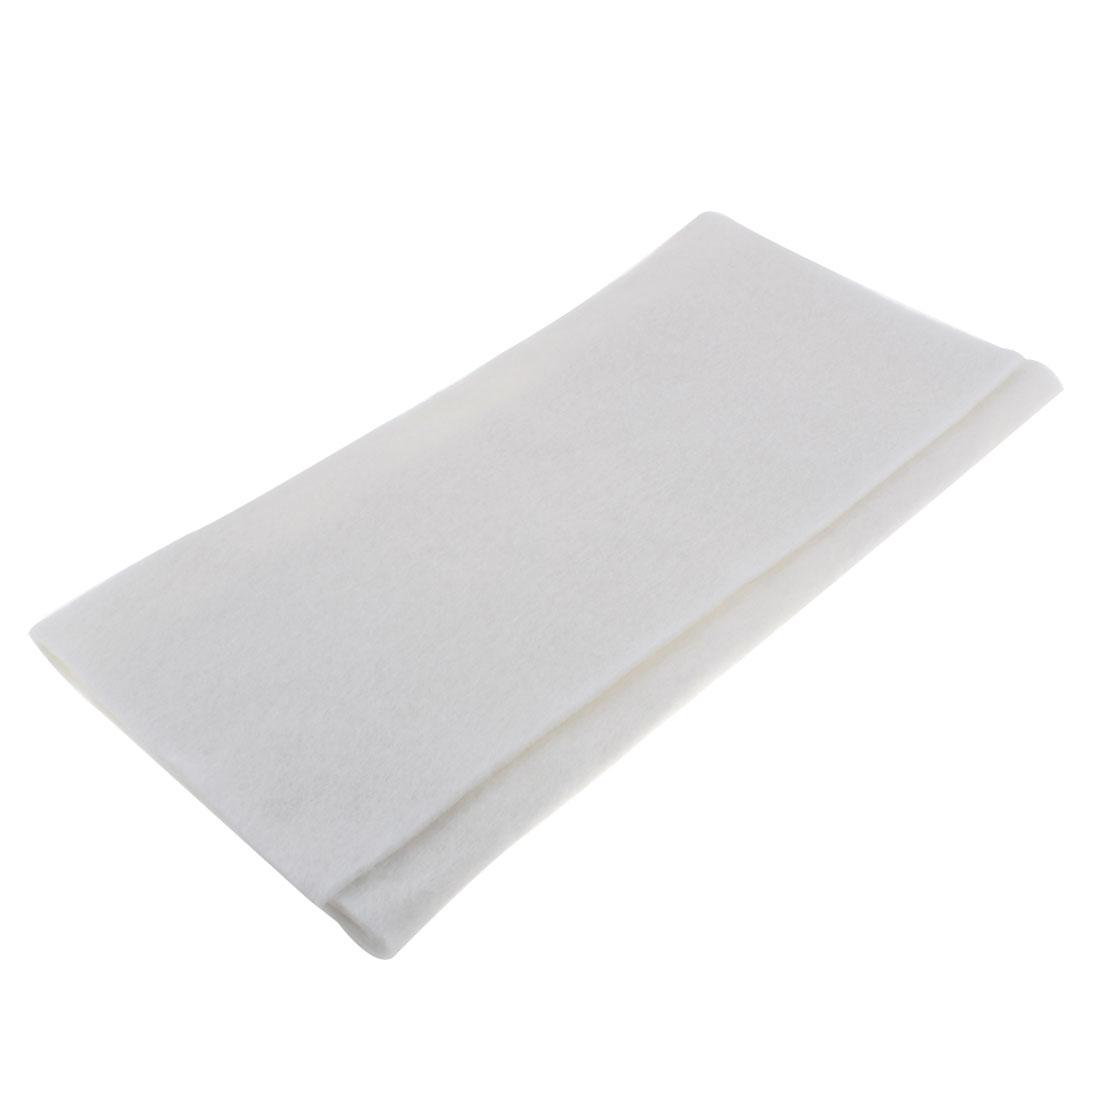 Aquarium Fish Tank Biological Filter Foam Block Sponge Pad White 59 x 40 x 0.3cm